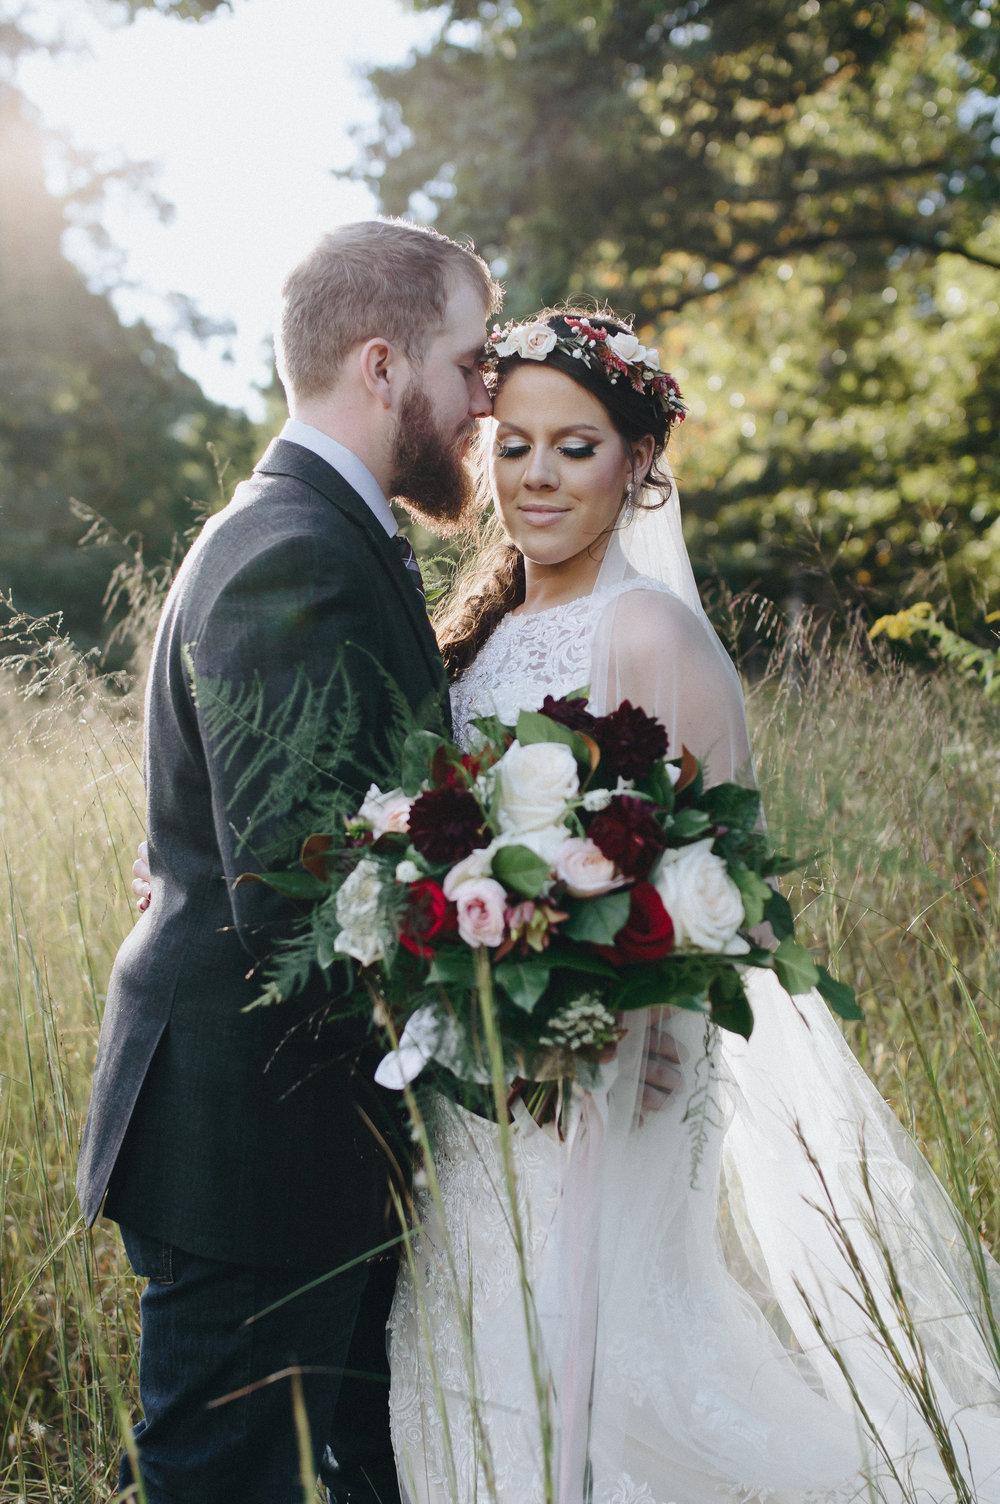 Lauren_Dustin_Wedding - EDITS-23.jpg